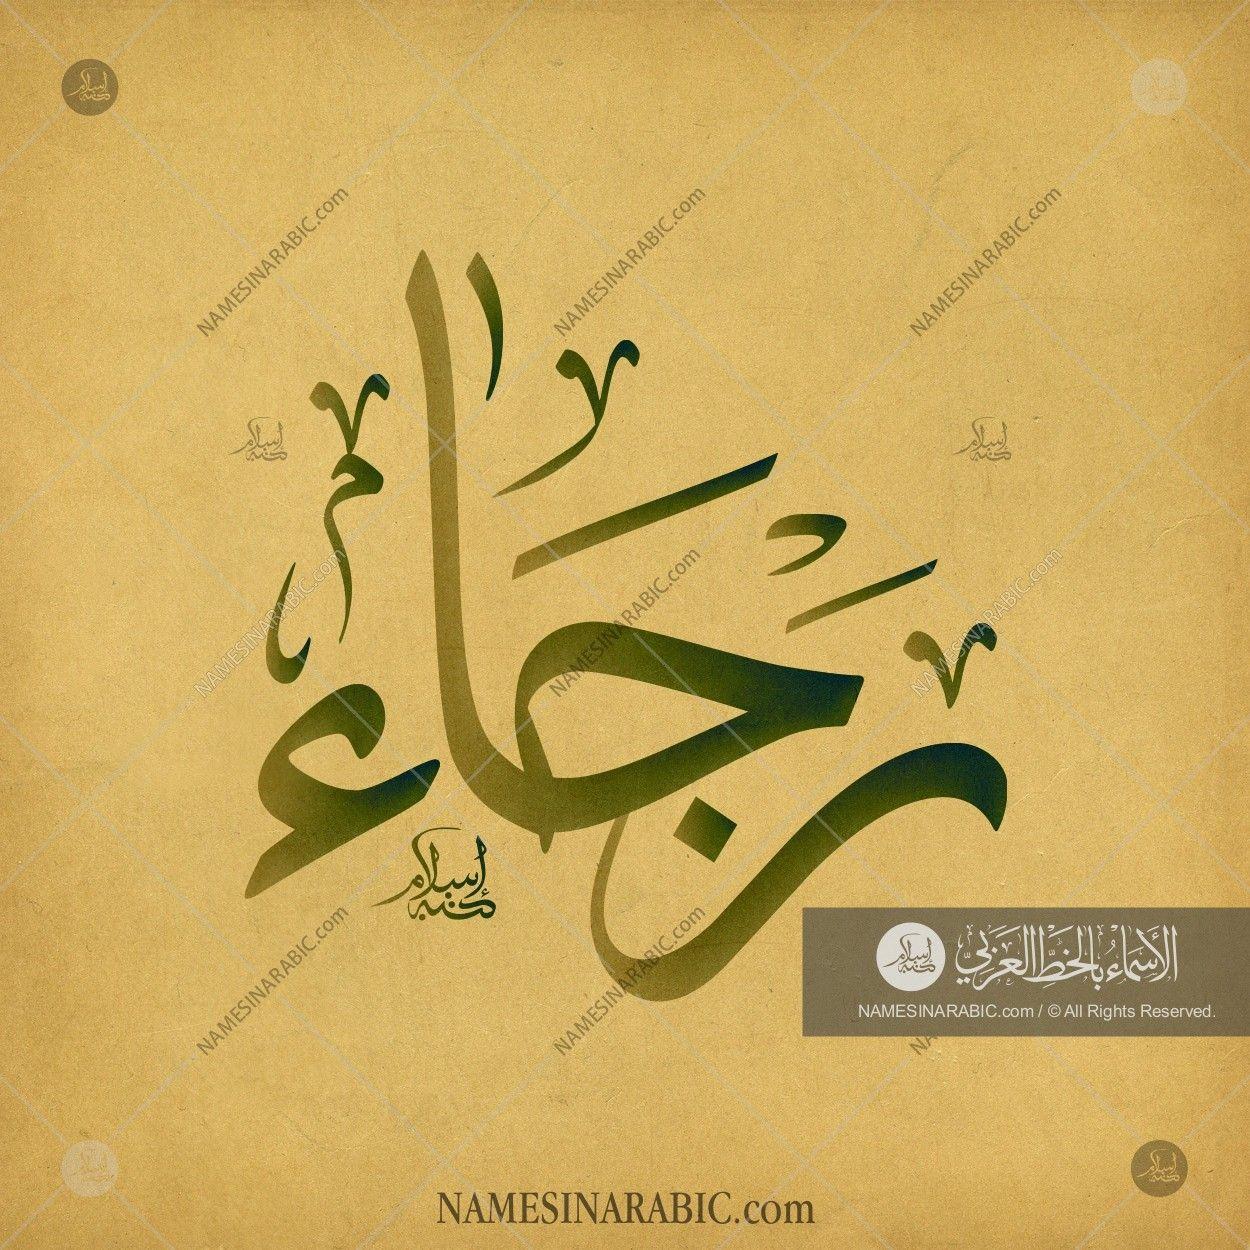 Rajaa رجاء Names In Arabic Calligraphy Name 3470 Calligraphy Name Calligraphy Arabic Calligraphy Art